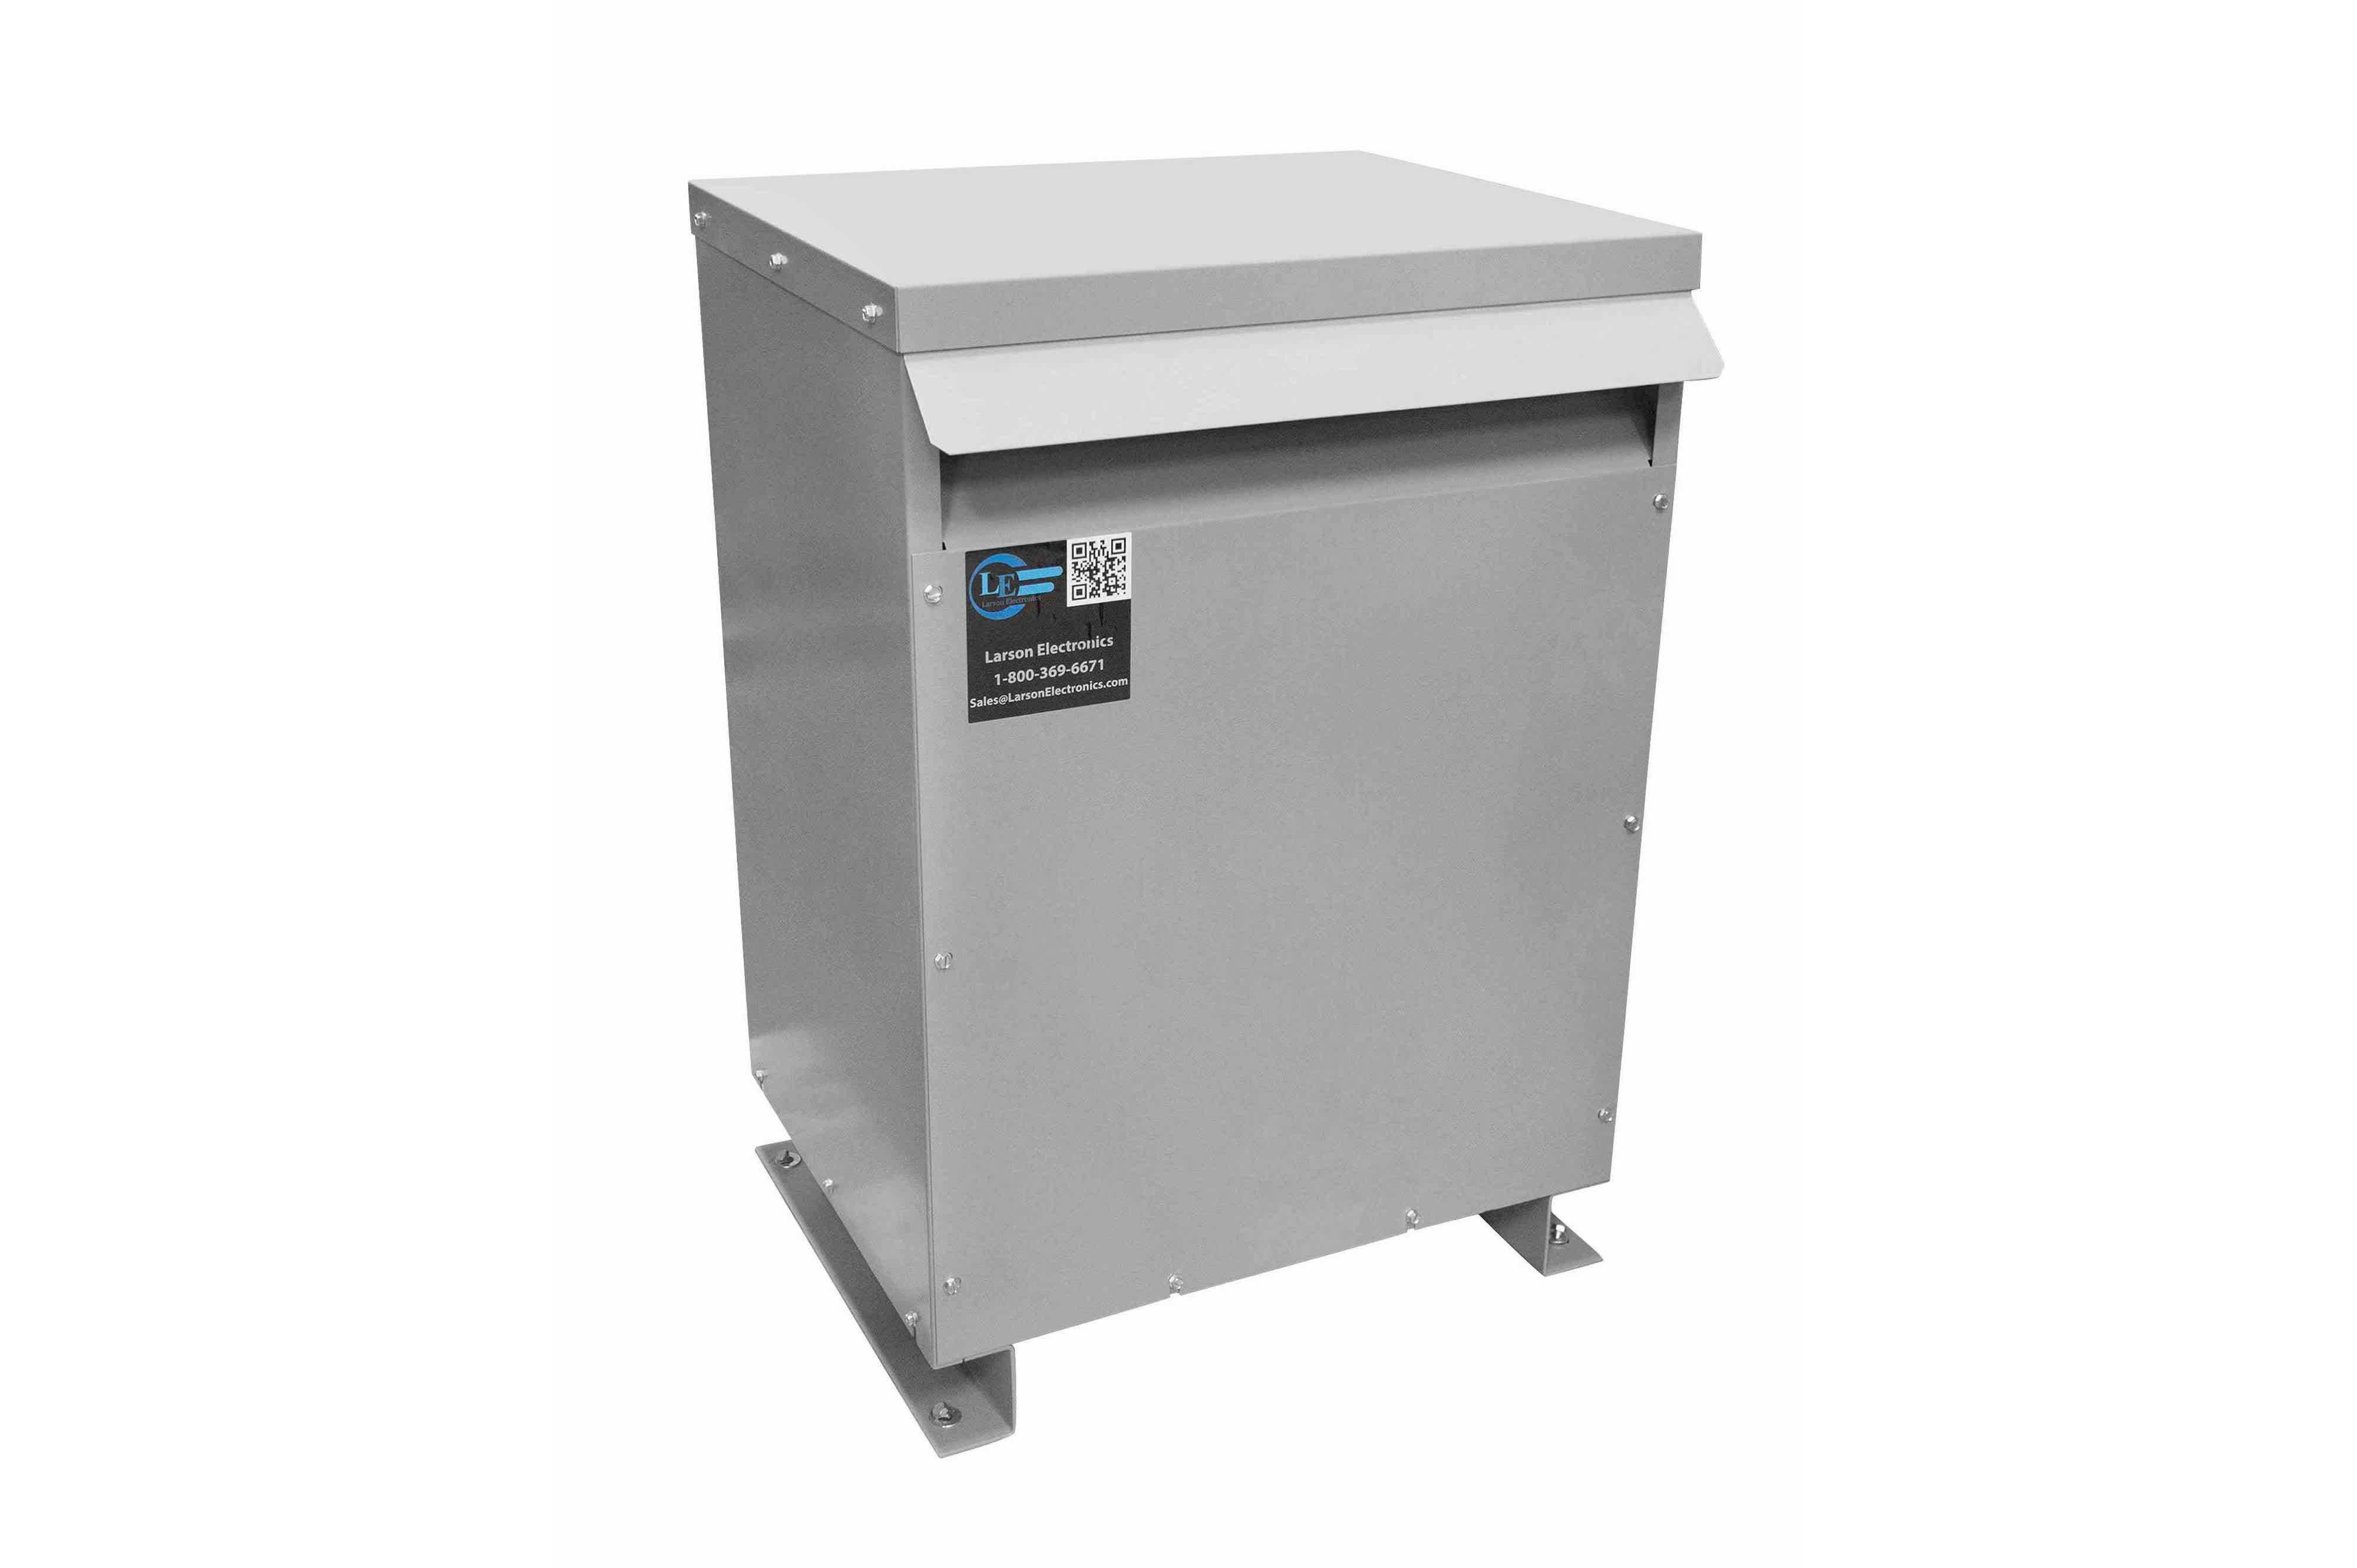 100 kVA 3PH Isolation Transformer, 575V Wye Primary, 415Y/240 Wye-N Secondary, N3R, Ventilated, 60 Hz